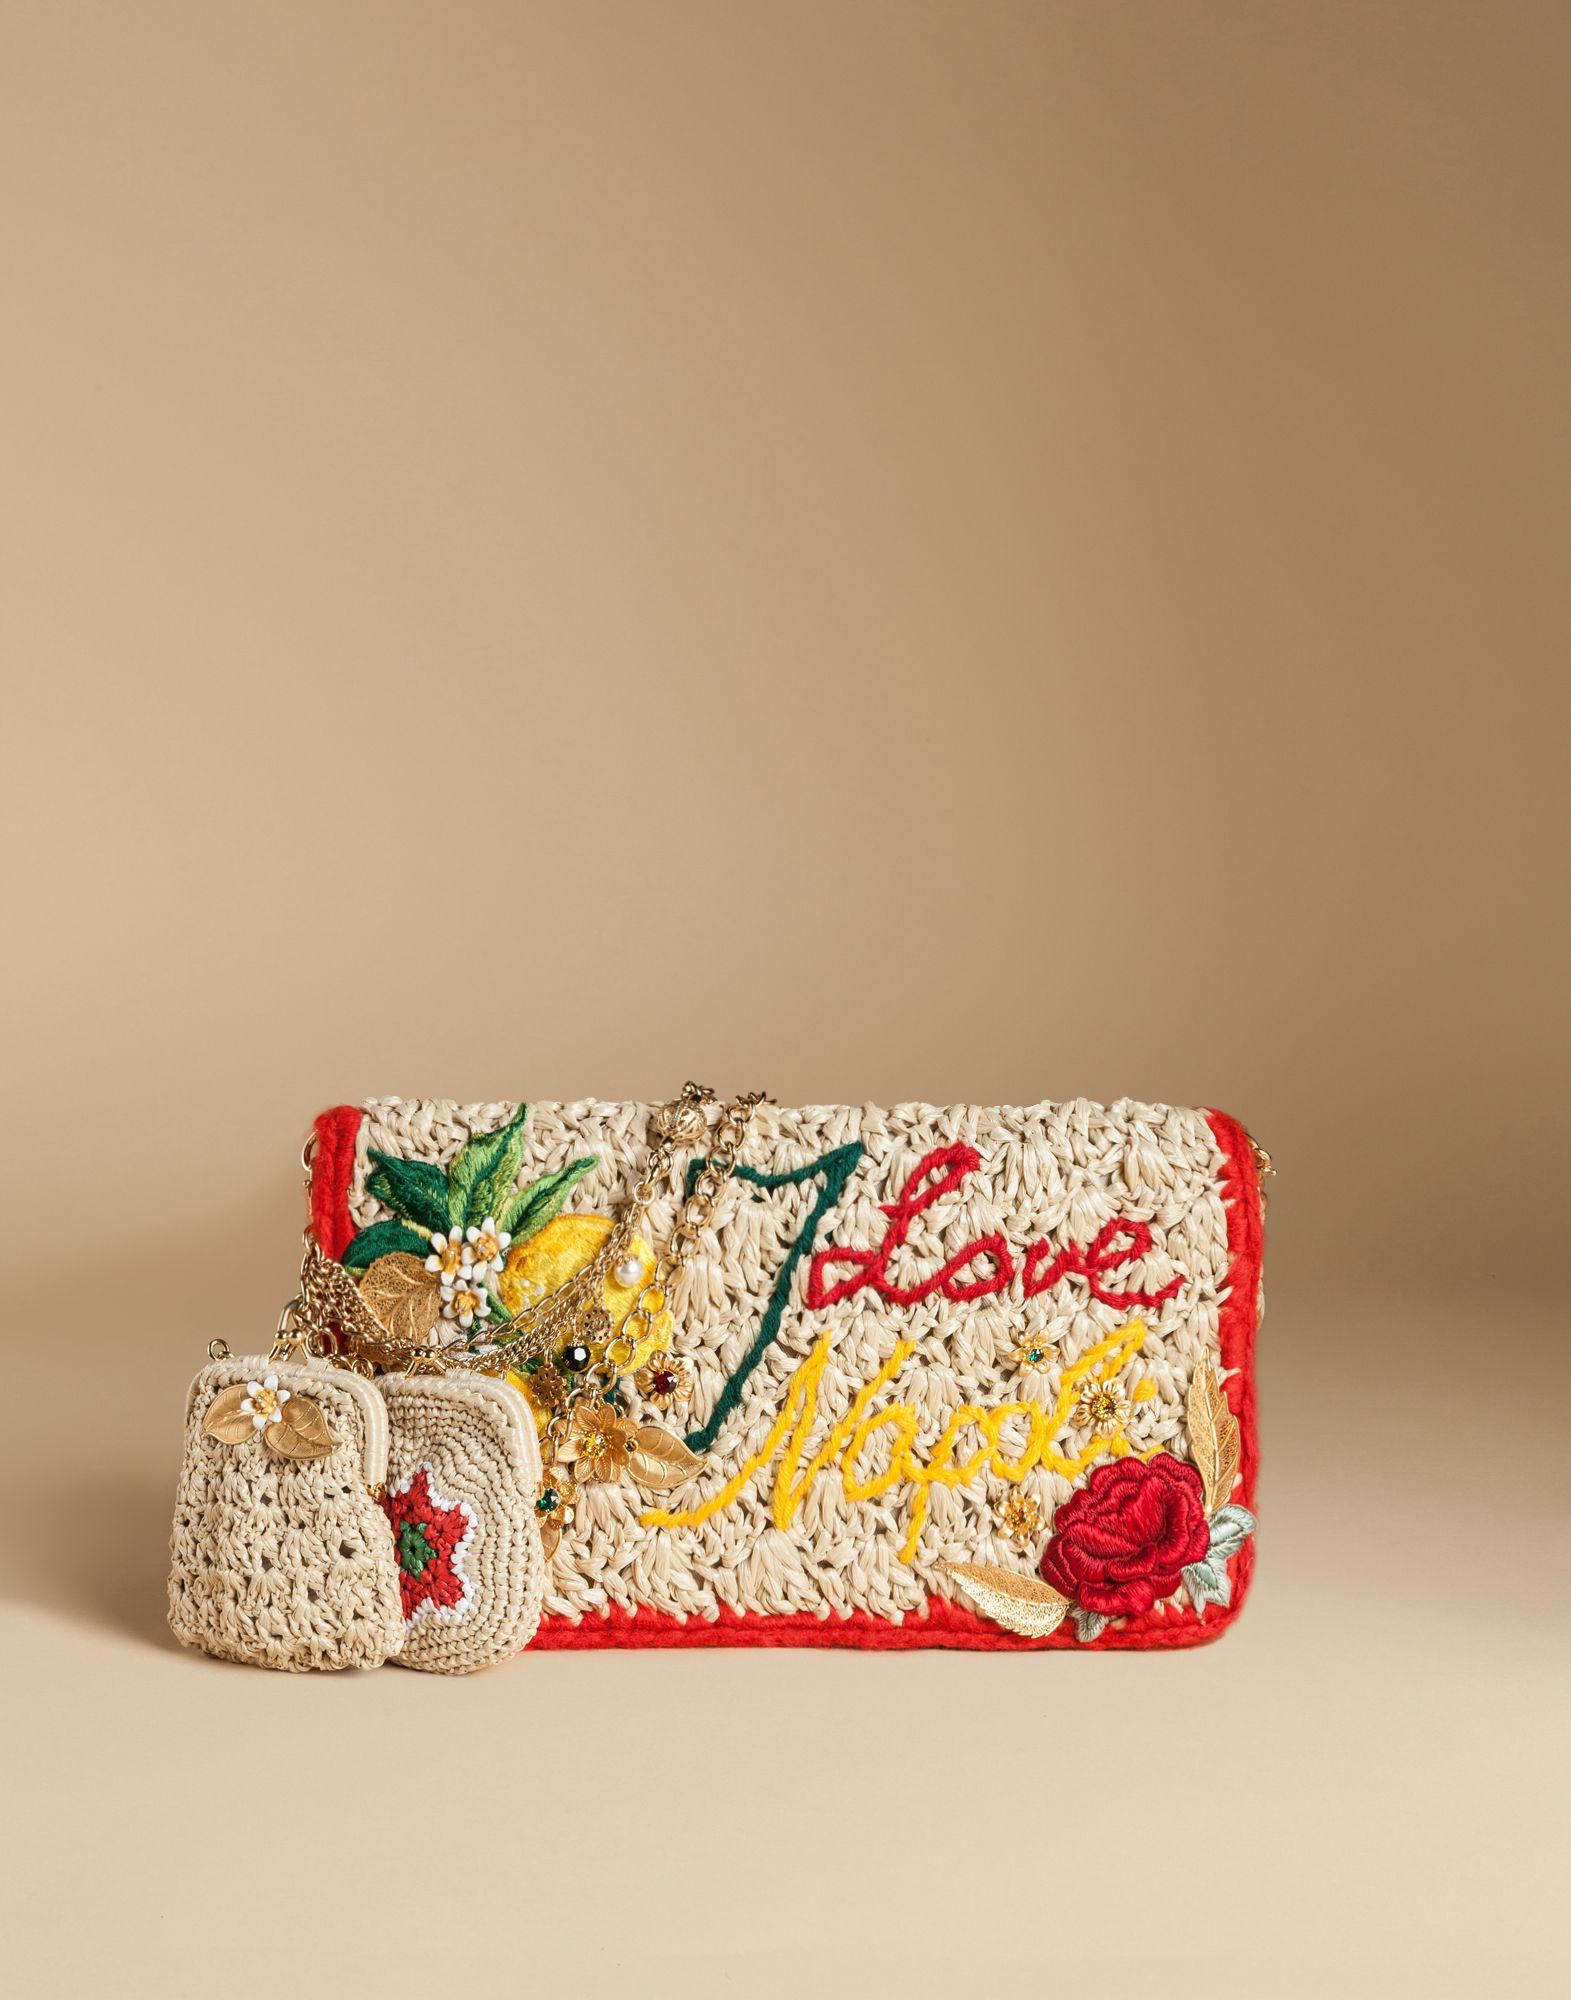 e69a81c00a Dolce   gabbana rosa raffia bag with embroidery and appliqués